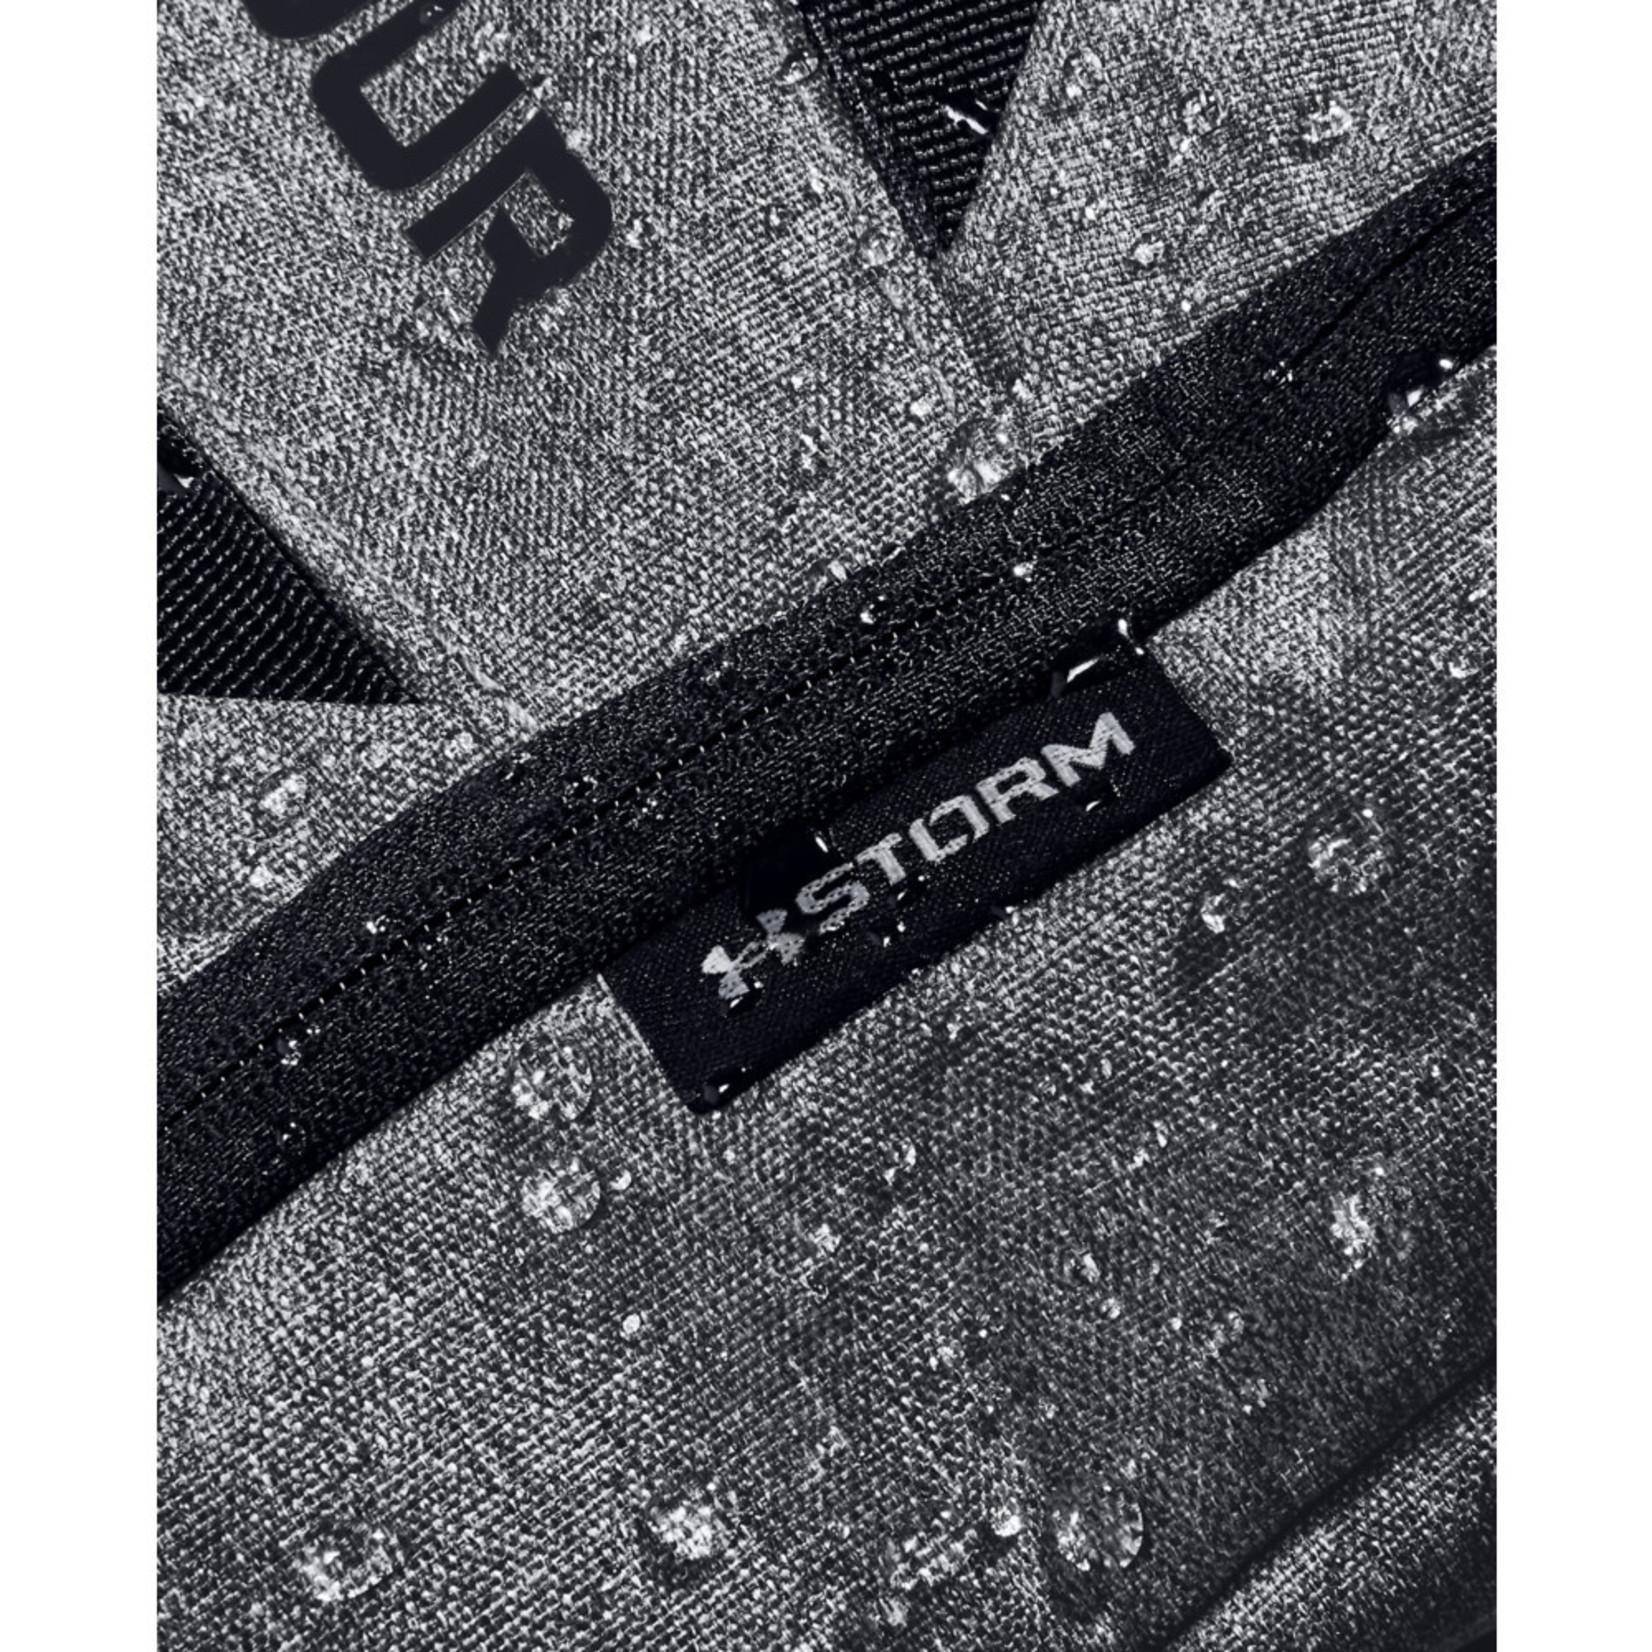 Under Armour UA Hustle 5.0 Backpack - Black-GRAPHITE MEDIUM HEATHER-Black - OSFA